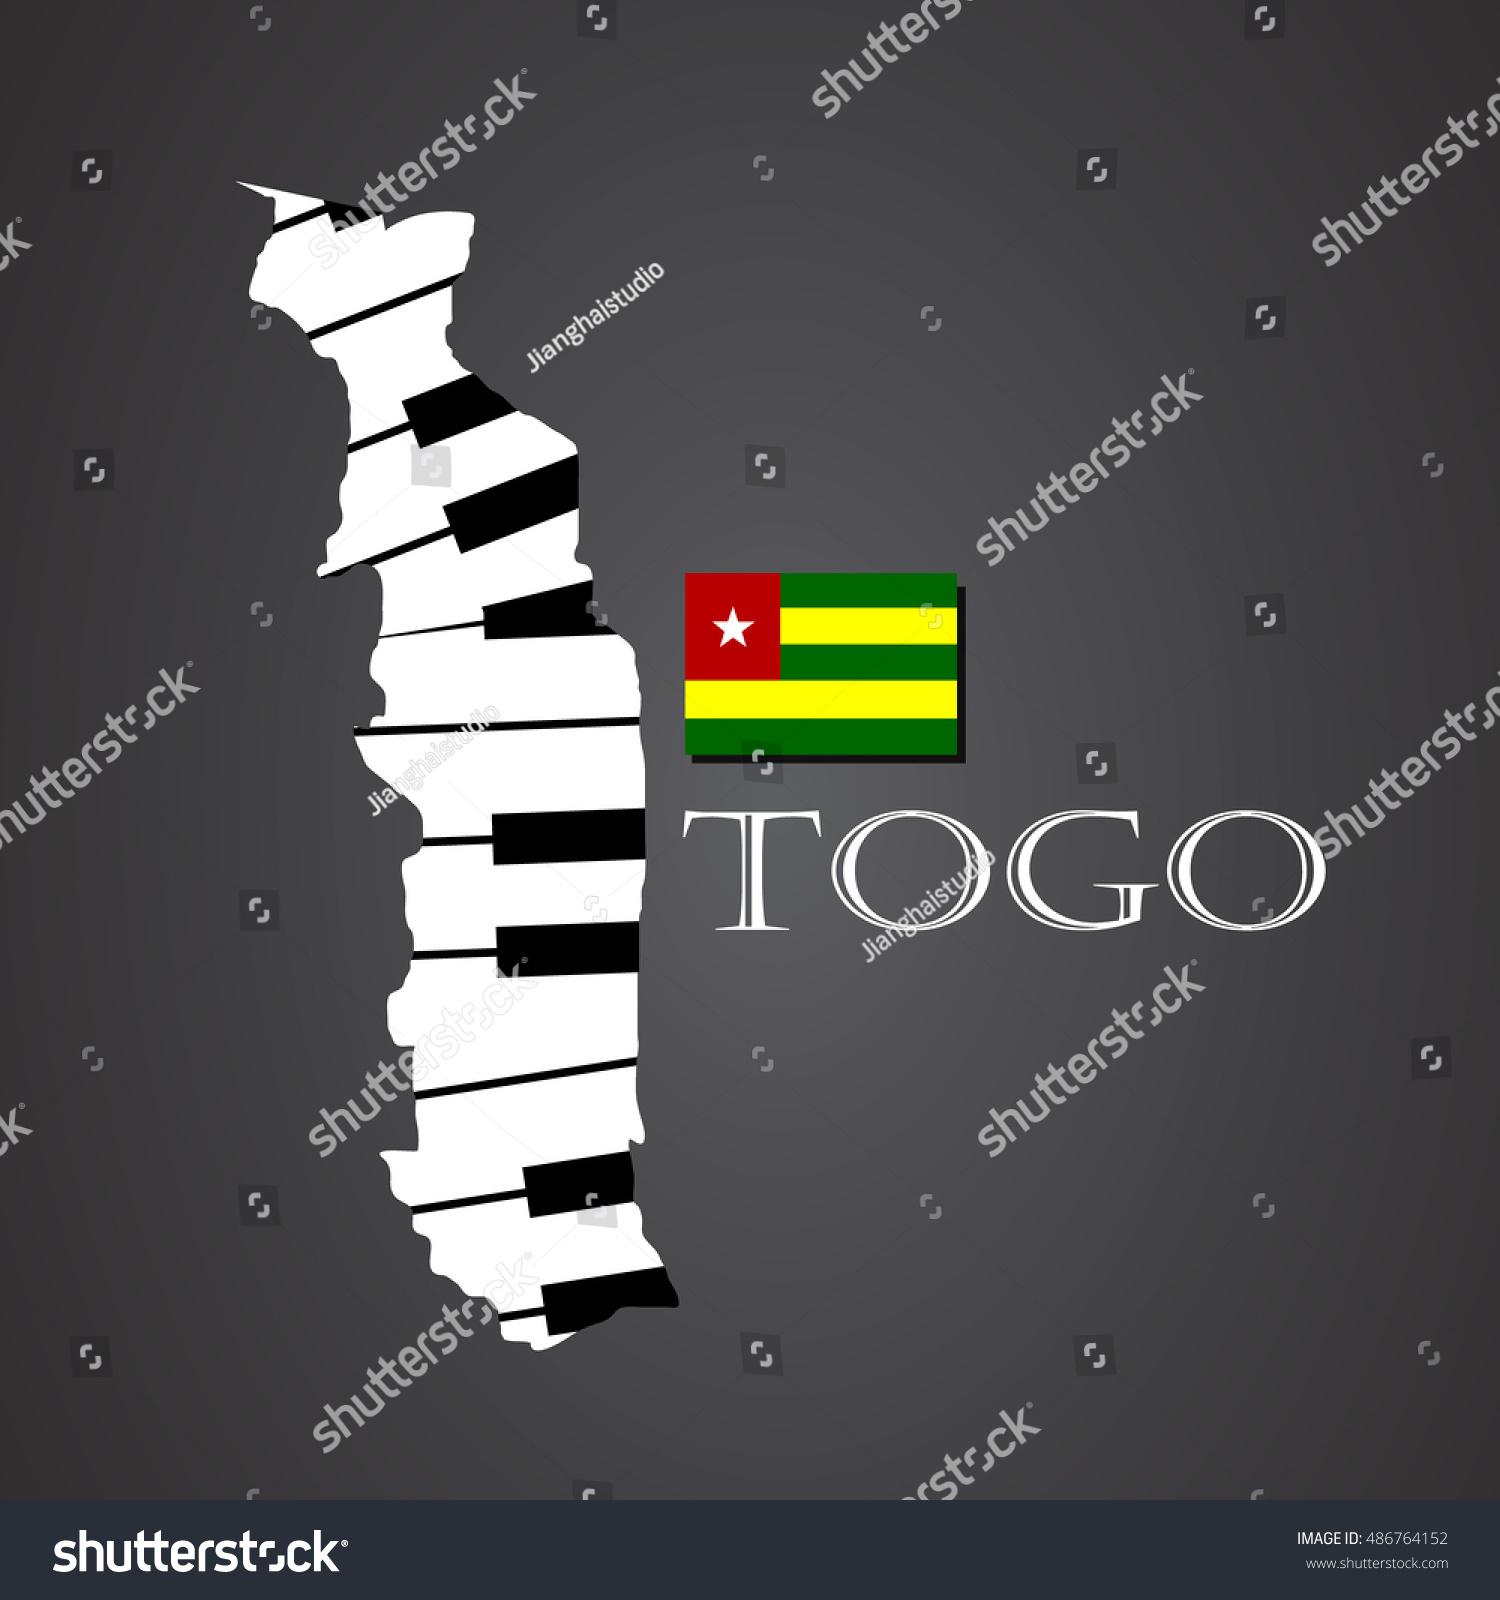 Togo Map Logo Made Piano Stock Vector 486764152 Shutterstock